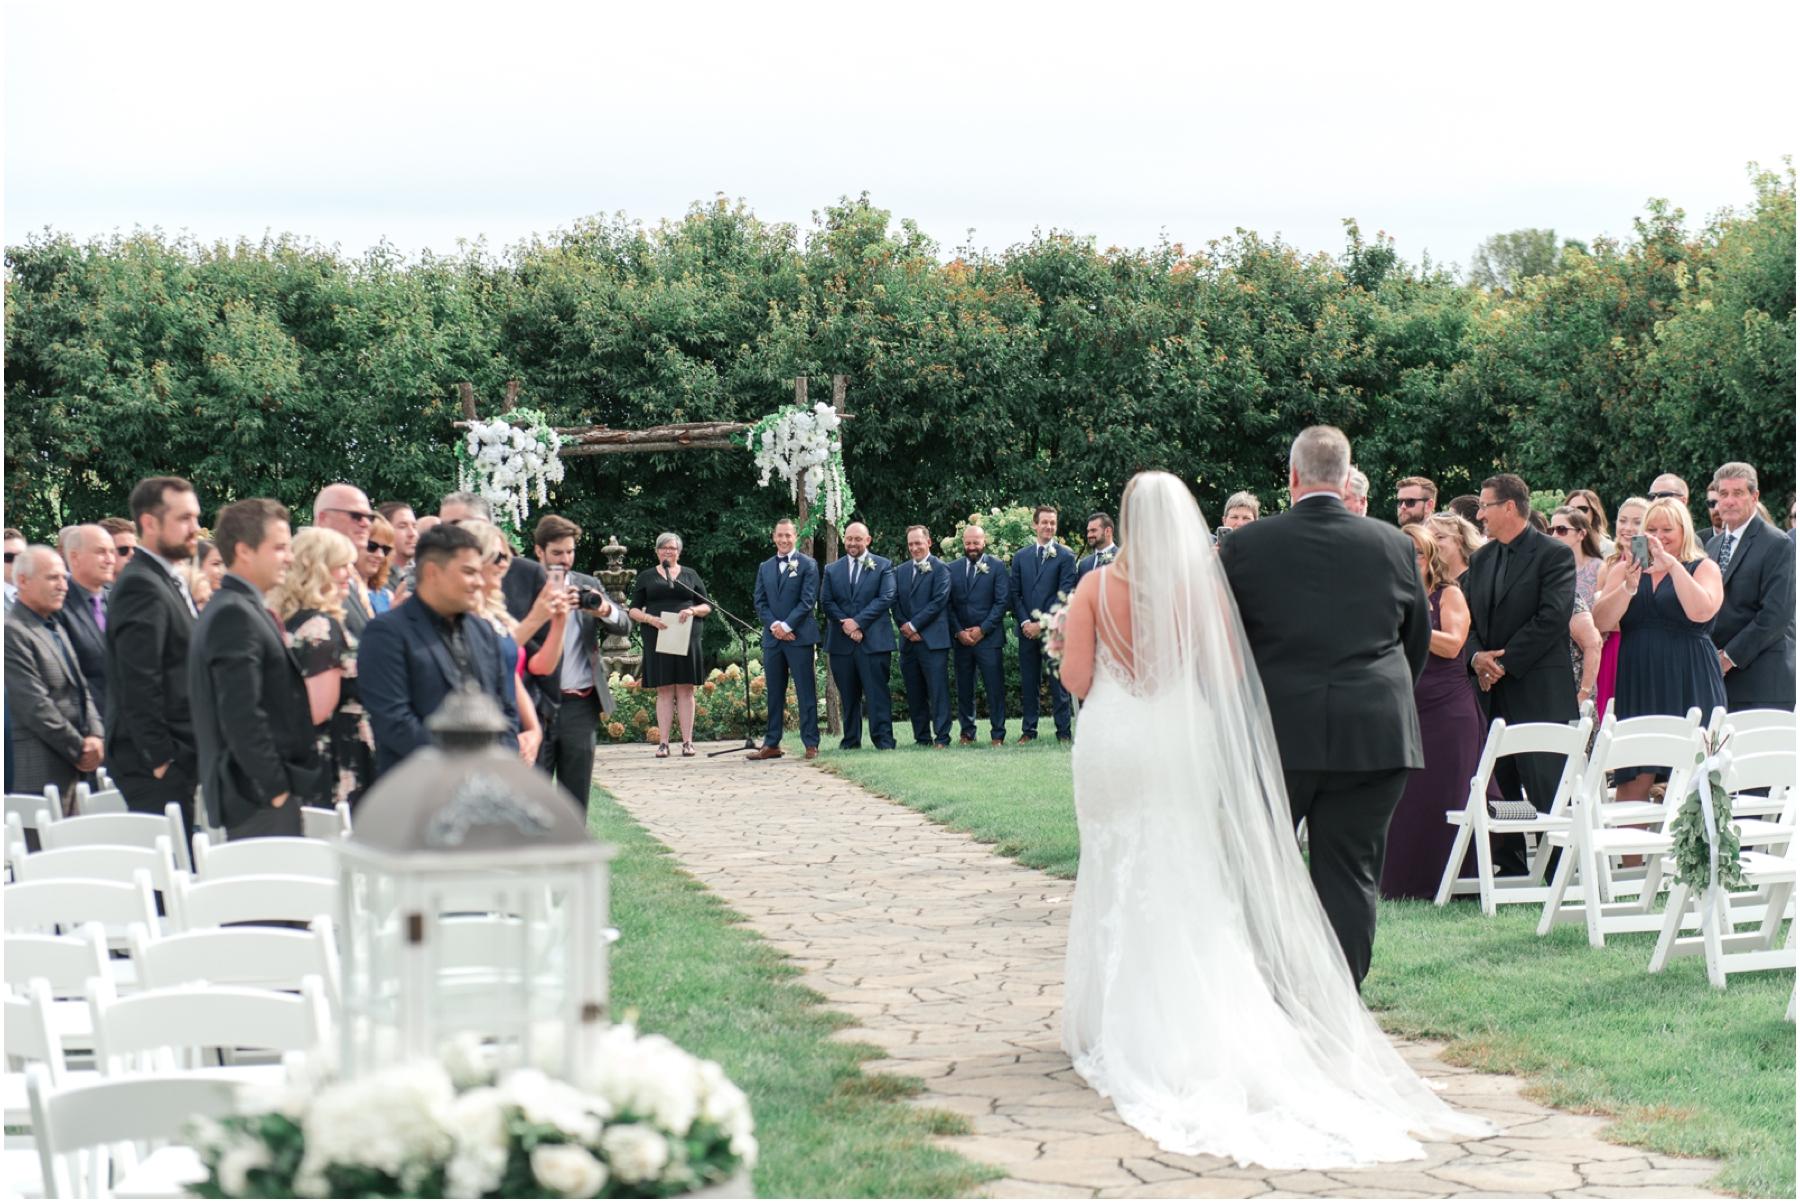 Bloom Field Gardens Wedding Precious Photography Katherine & Chris_044